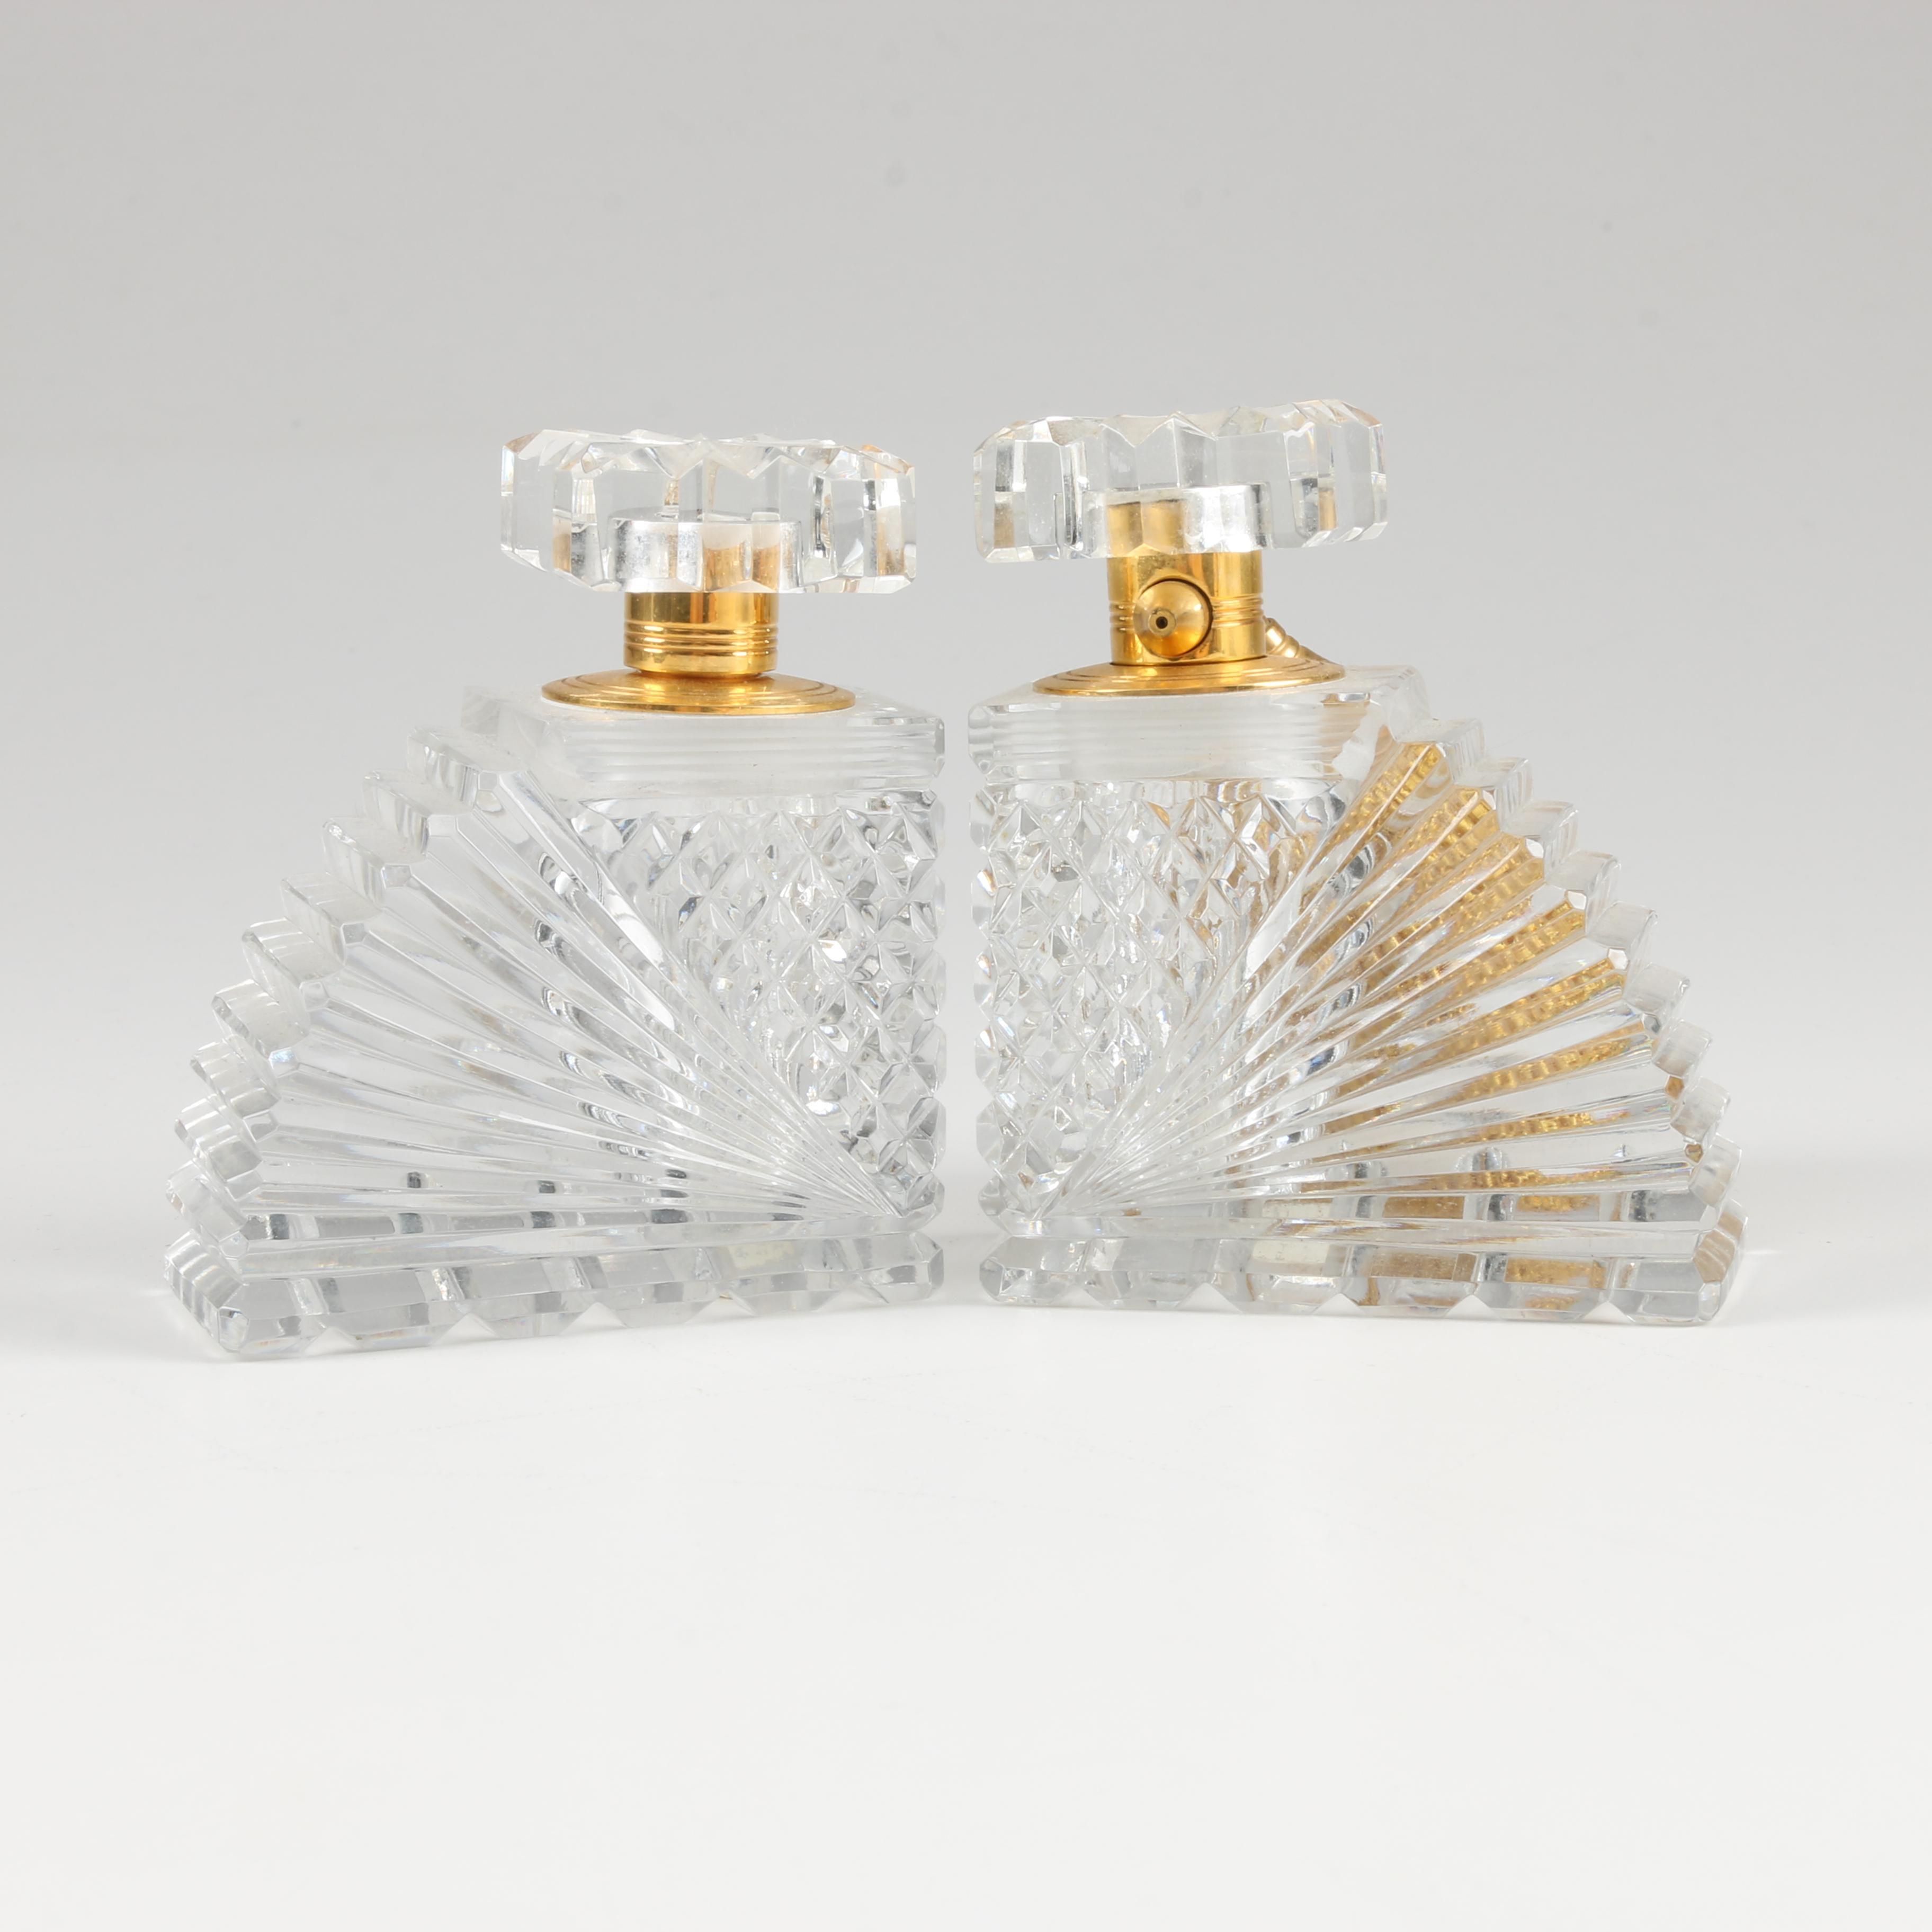 Pair of Art Deco Cut Glass Perfume Bottles